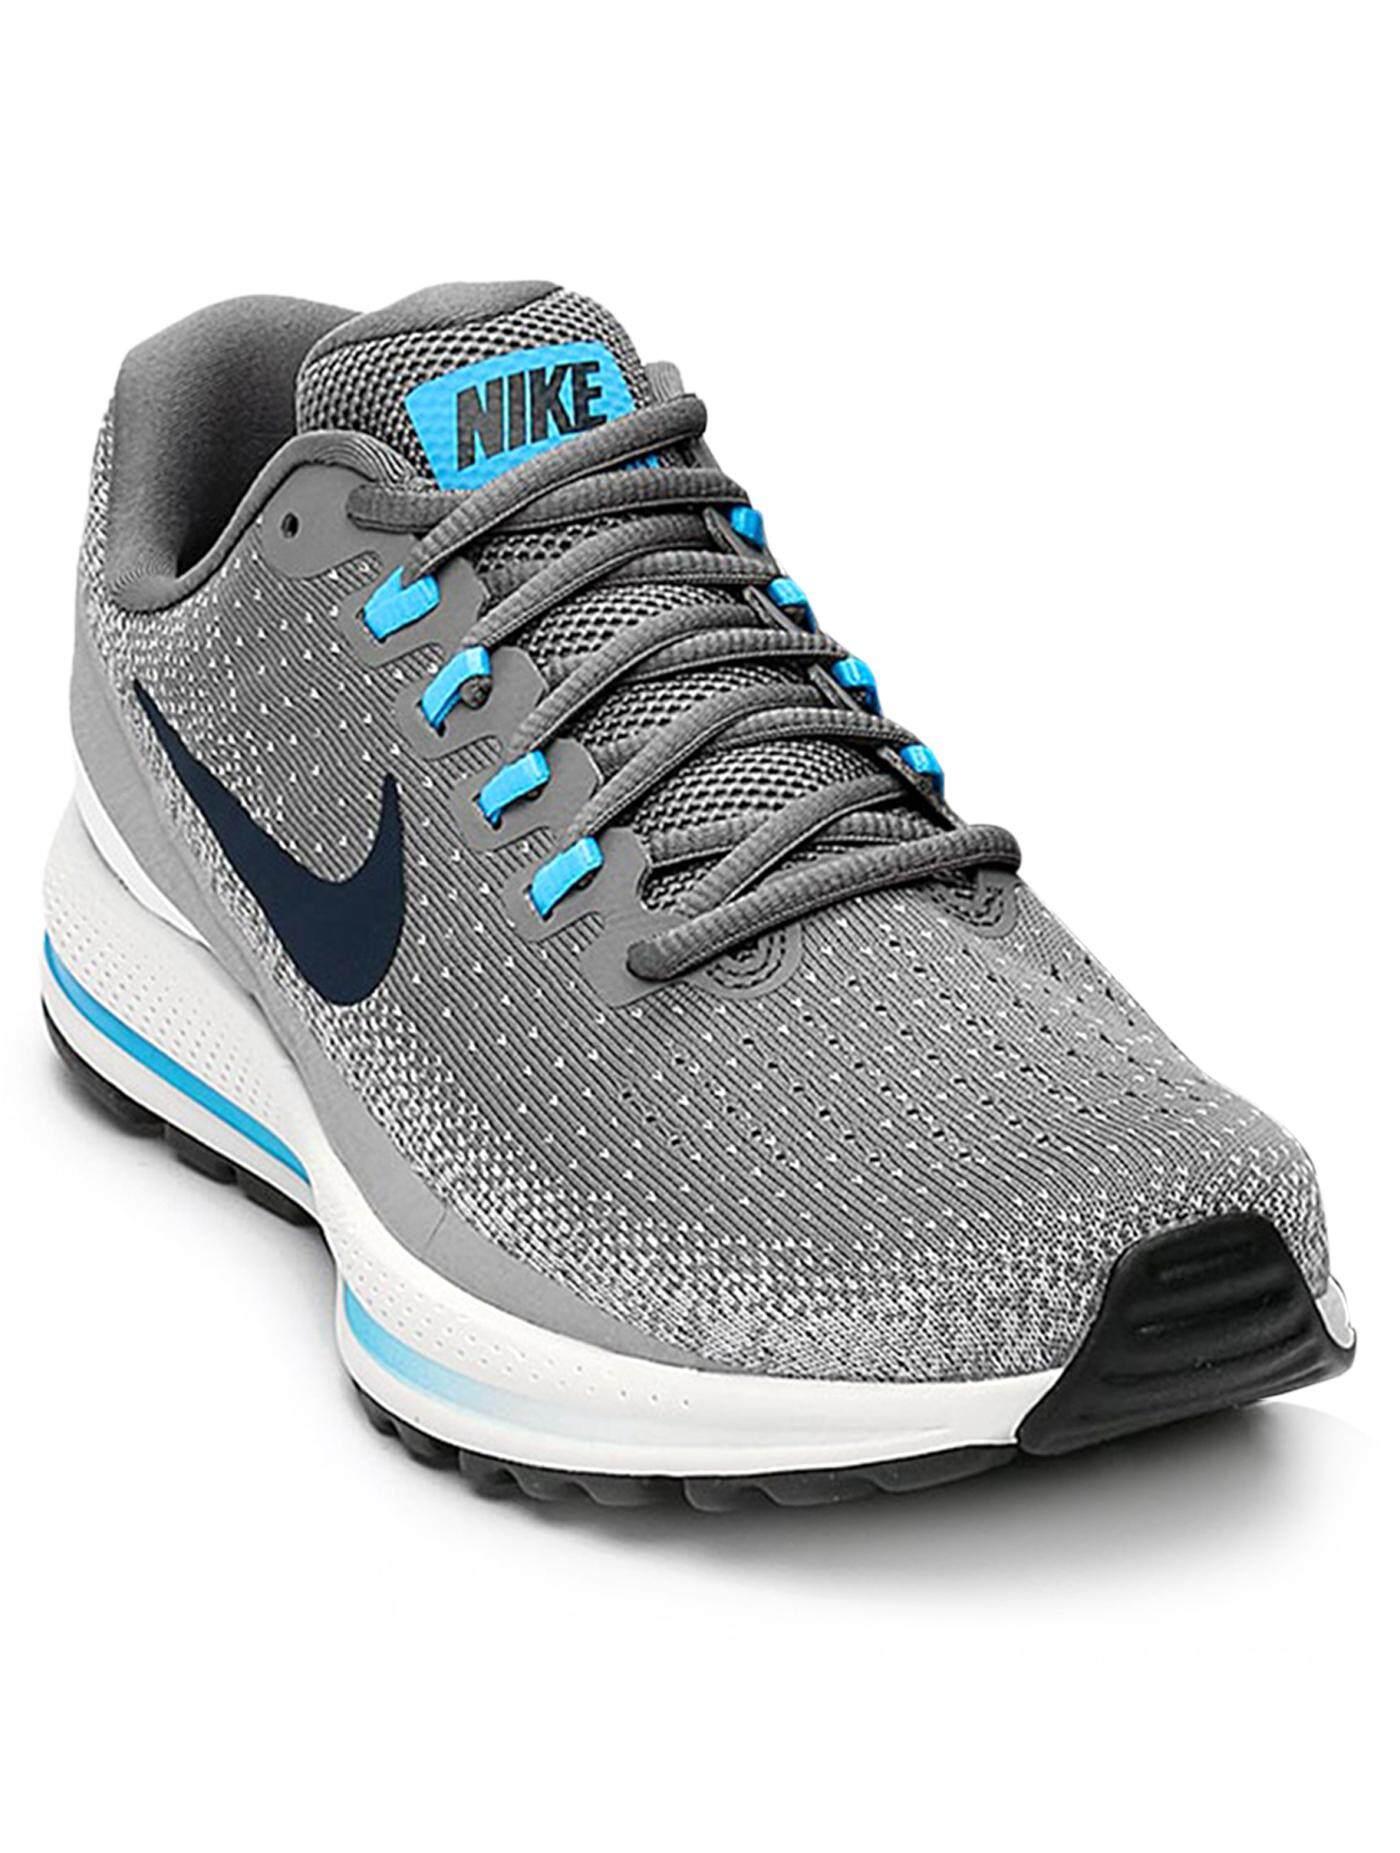 7b345af9ebe01 Home   Sports Men Shoes · NIKE รองเท้าวิ่งผู้ชาย รุ่น Air Zoom Vomero 13  922908-007 ไซส์ US9  สี